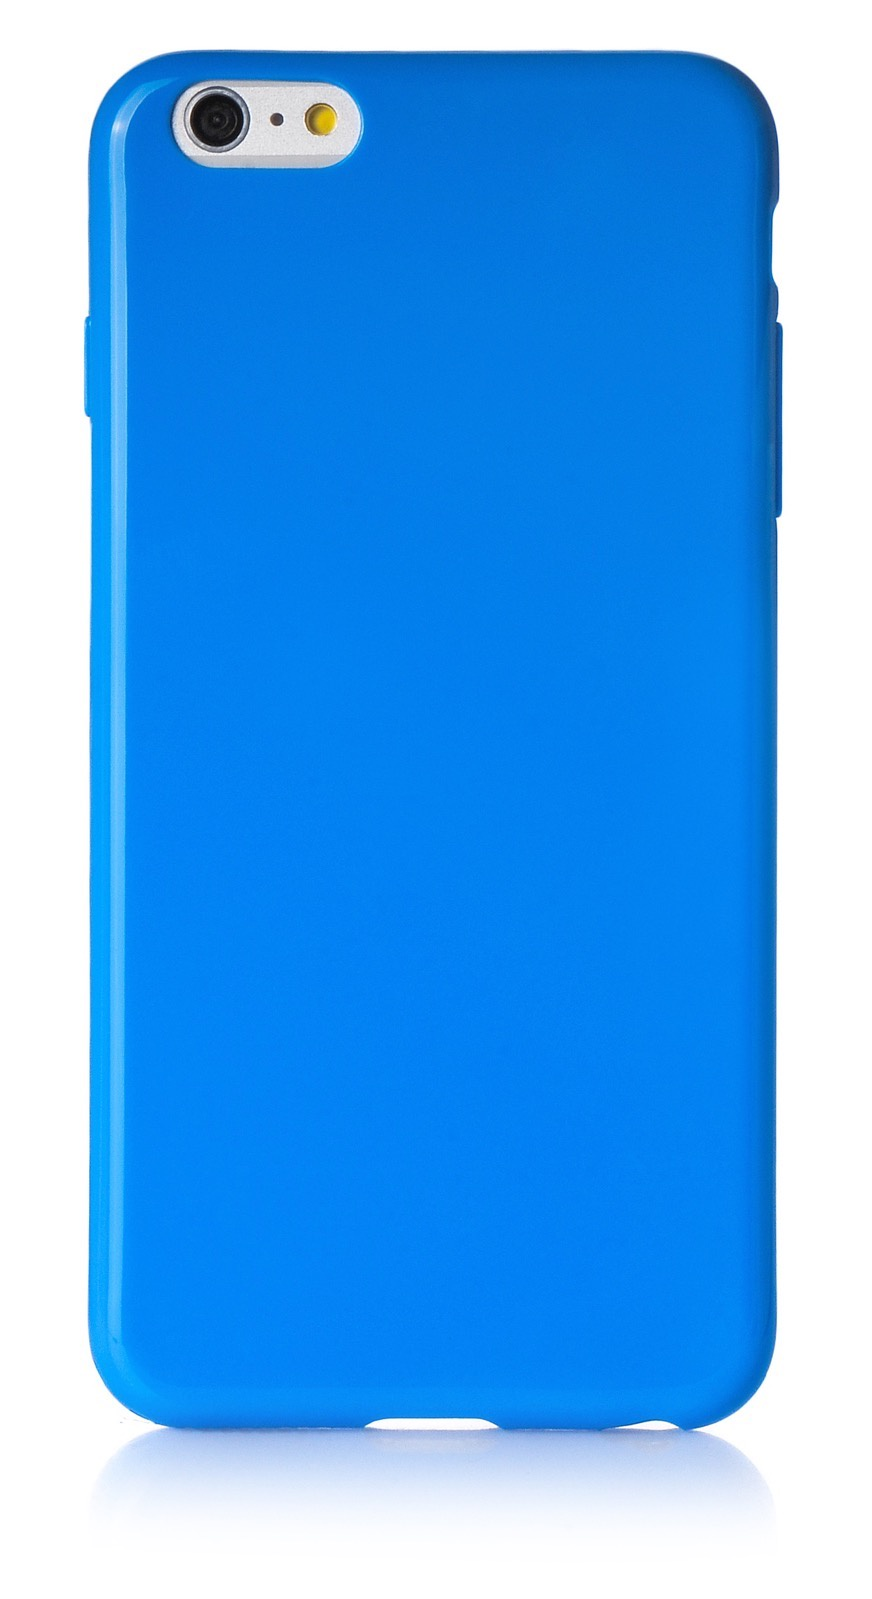 "Чехол для сотового телефона iNeez накладка силикон мыльница 620120 для Apple Iphone 6 Plus/6S Plus 5.5"", синий"